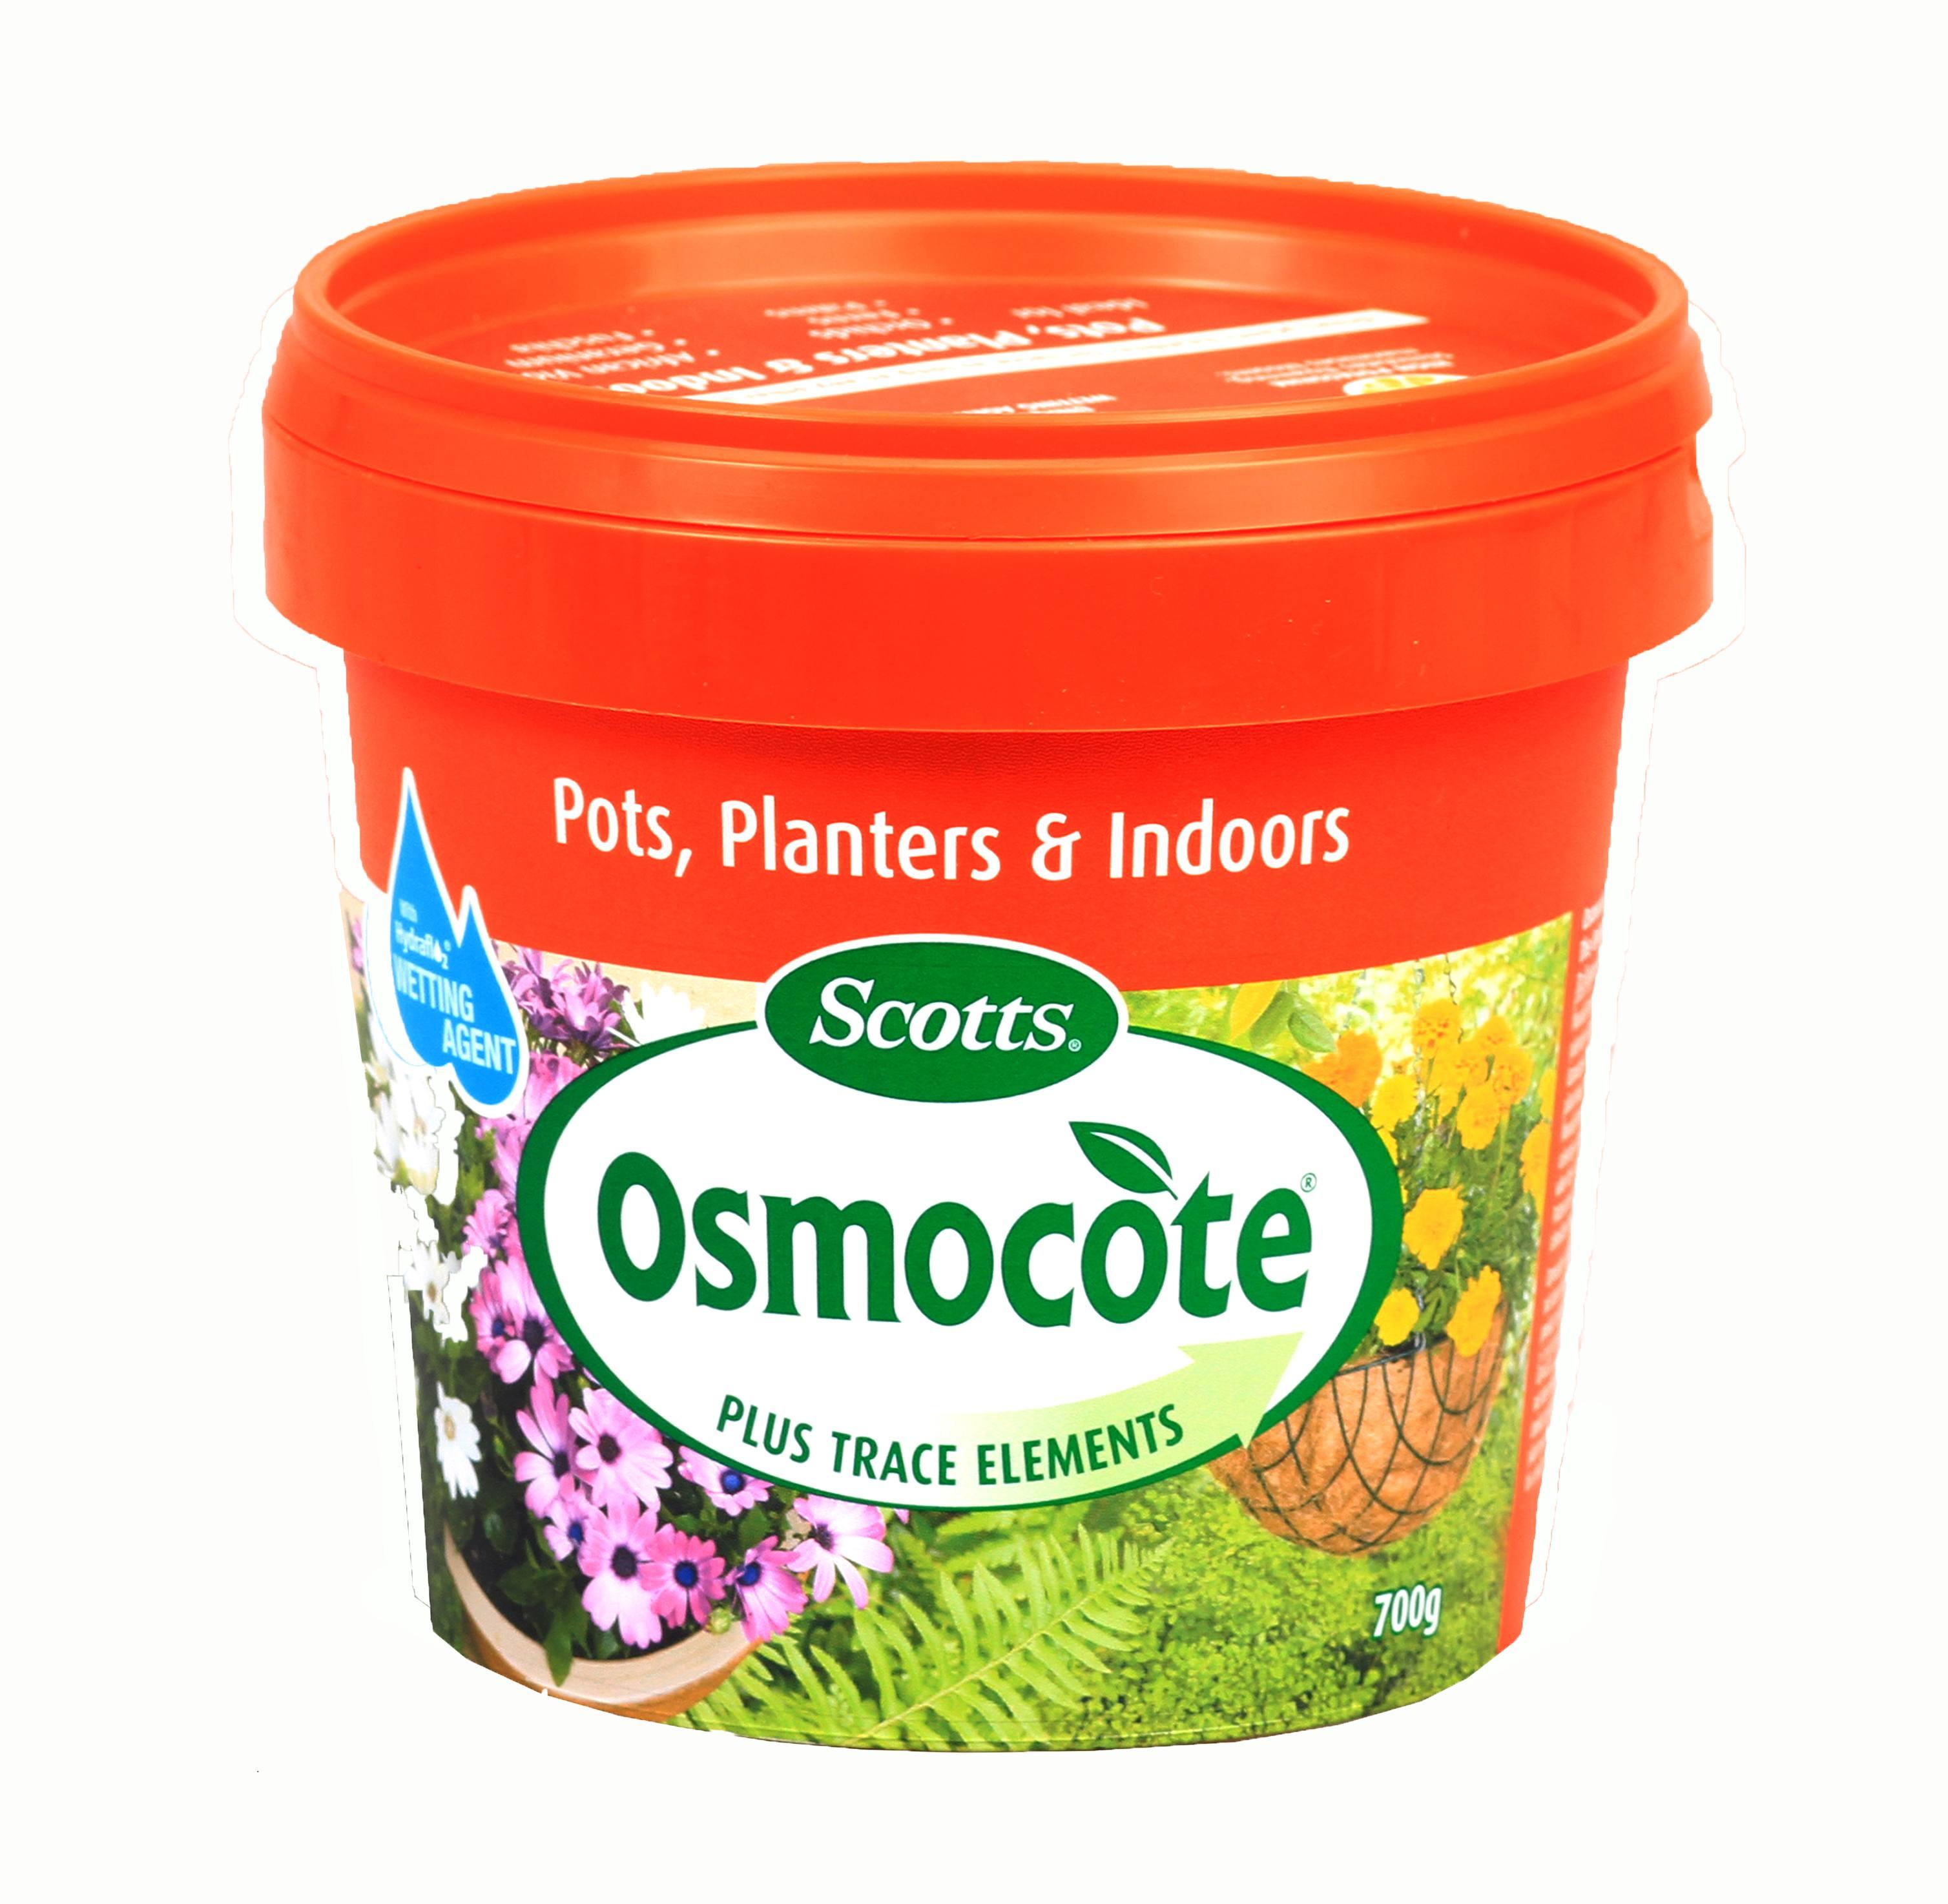 Osmocote Pots Planters & Indoors